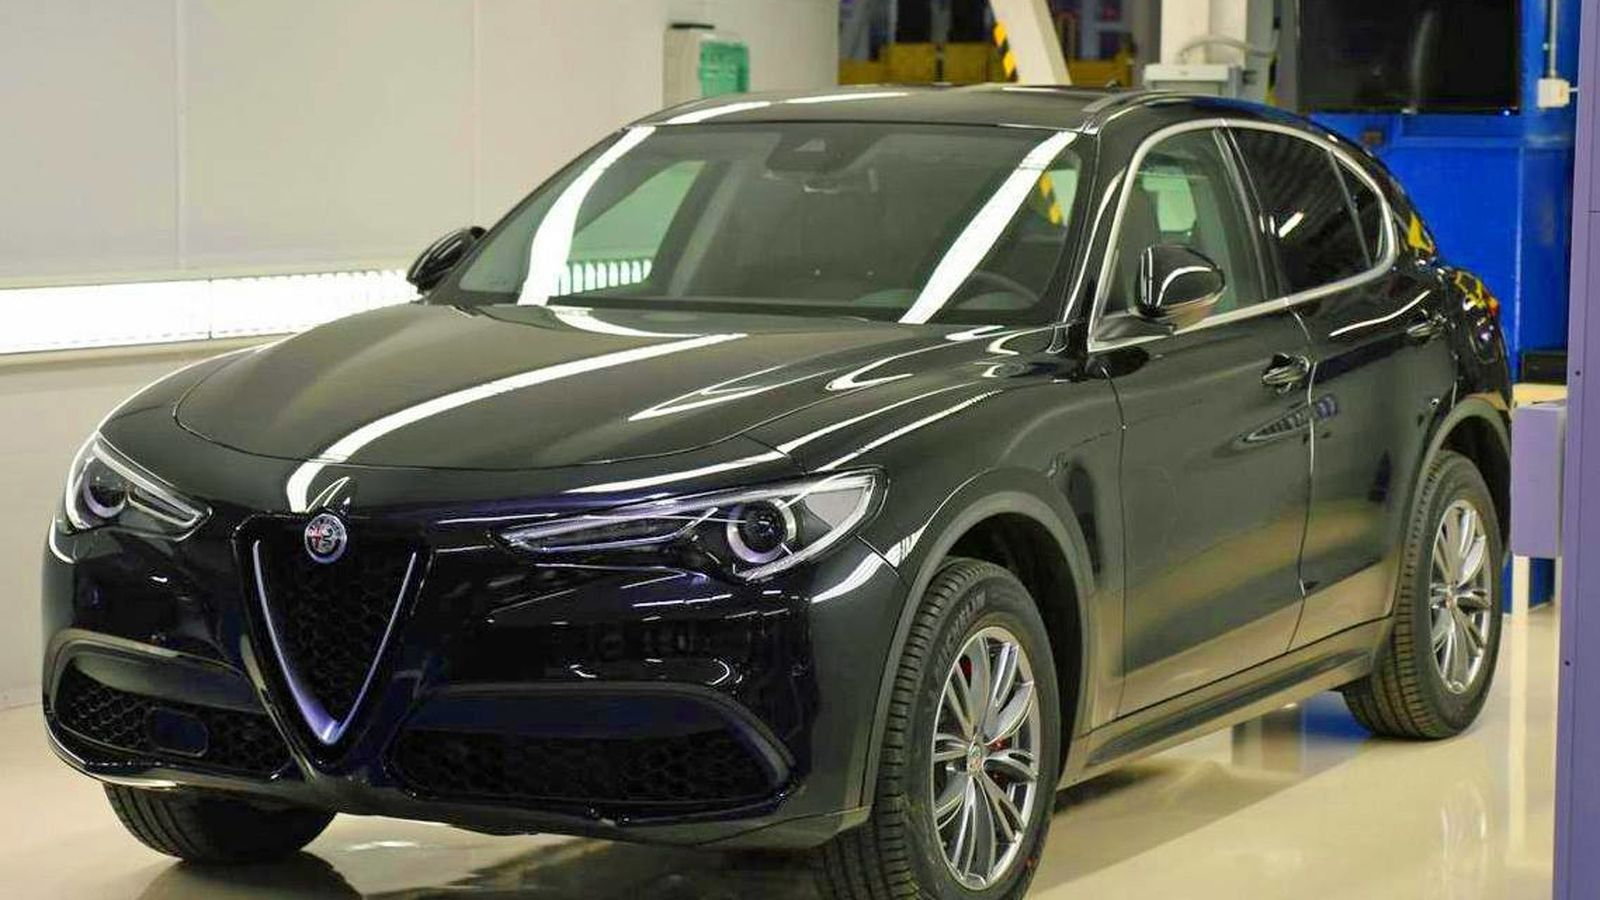 Alfa romeo giulia quadrifoglio model car 12